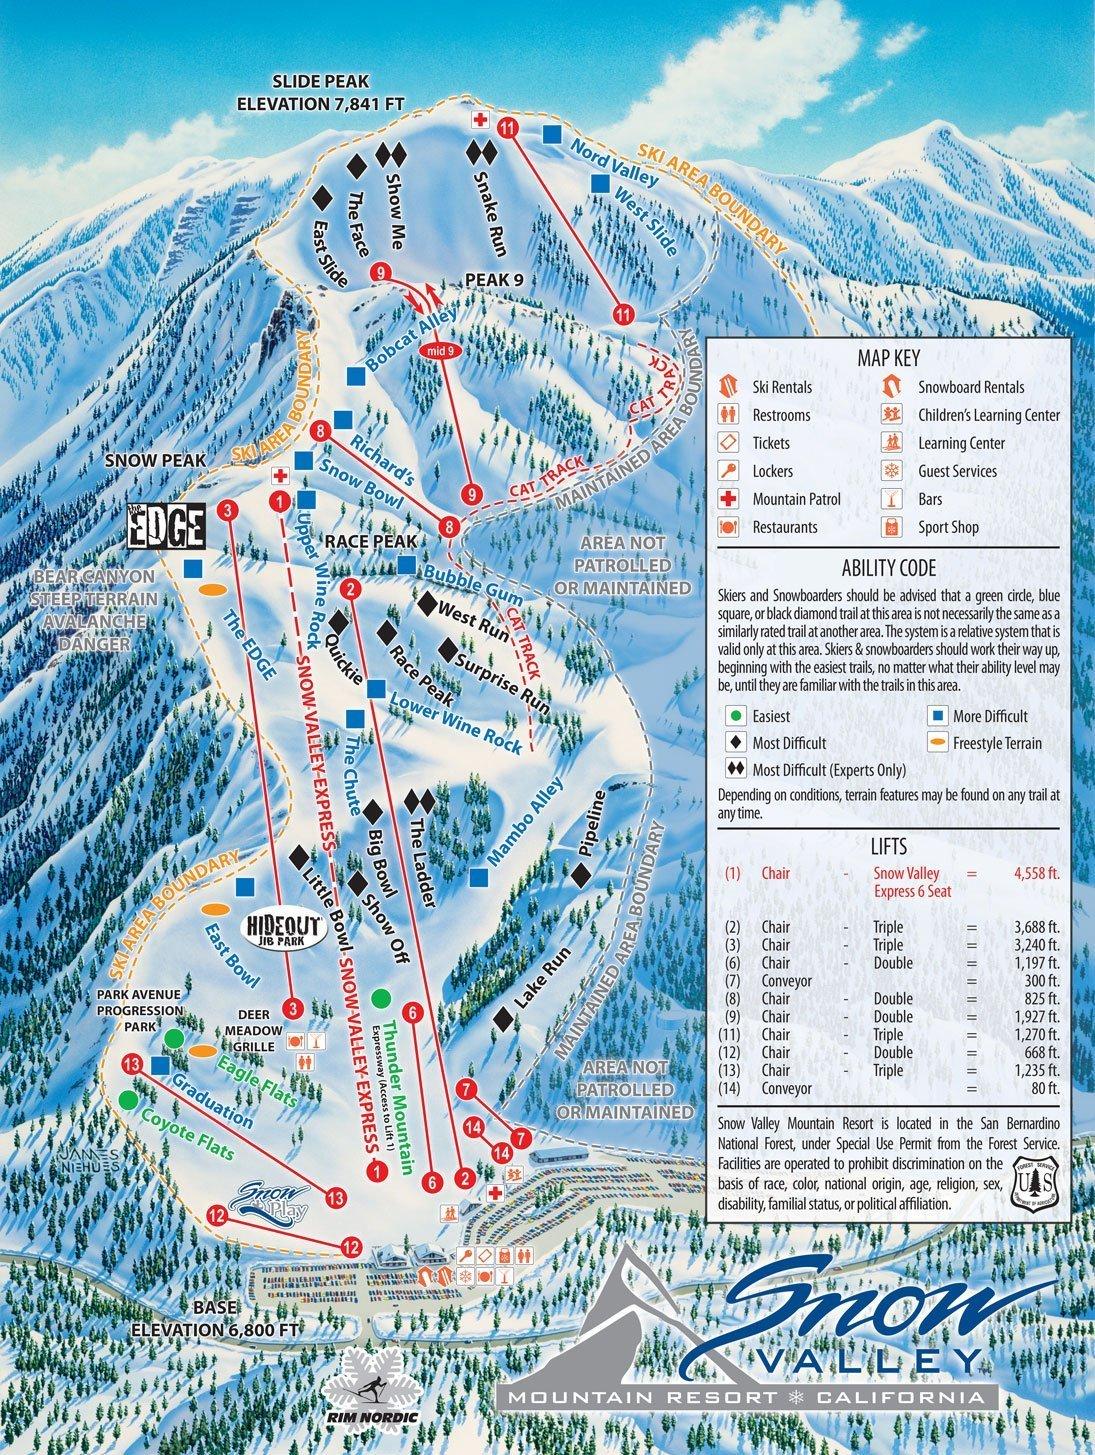 Snow Valley Ski Resort Piste / Trail Map